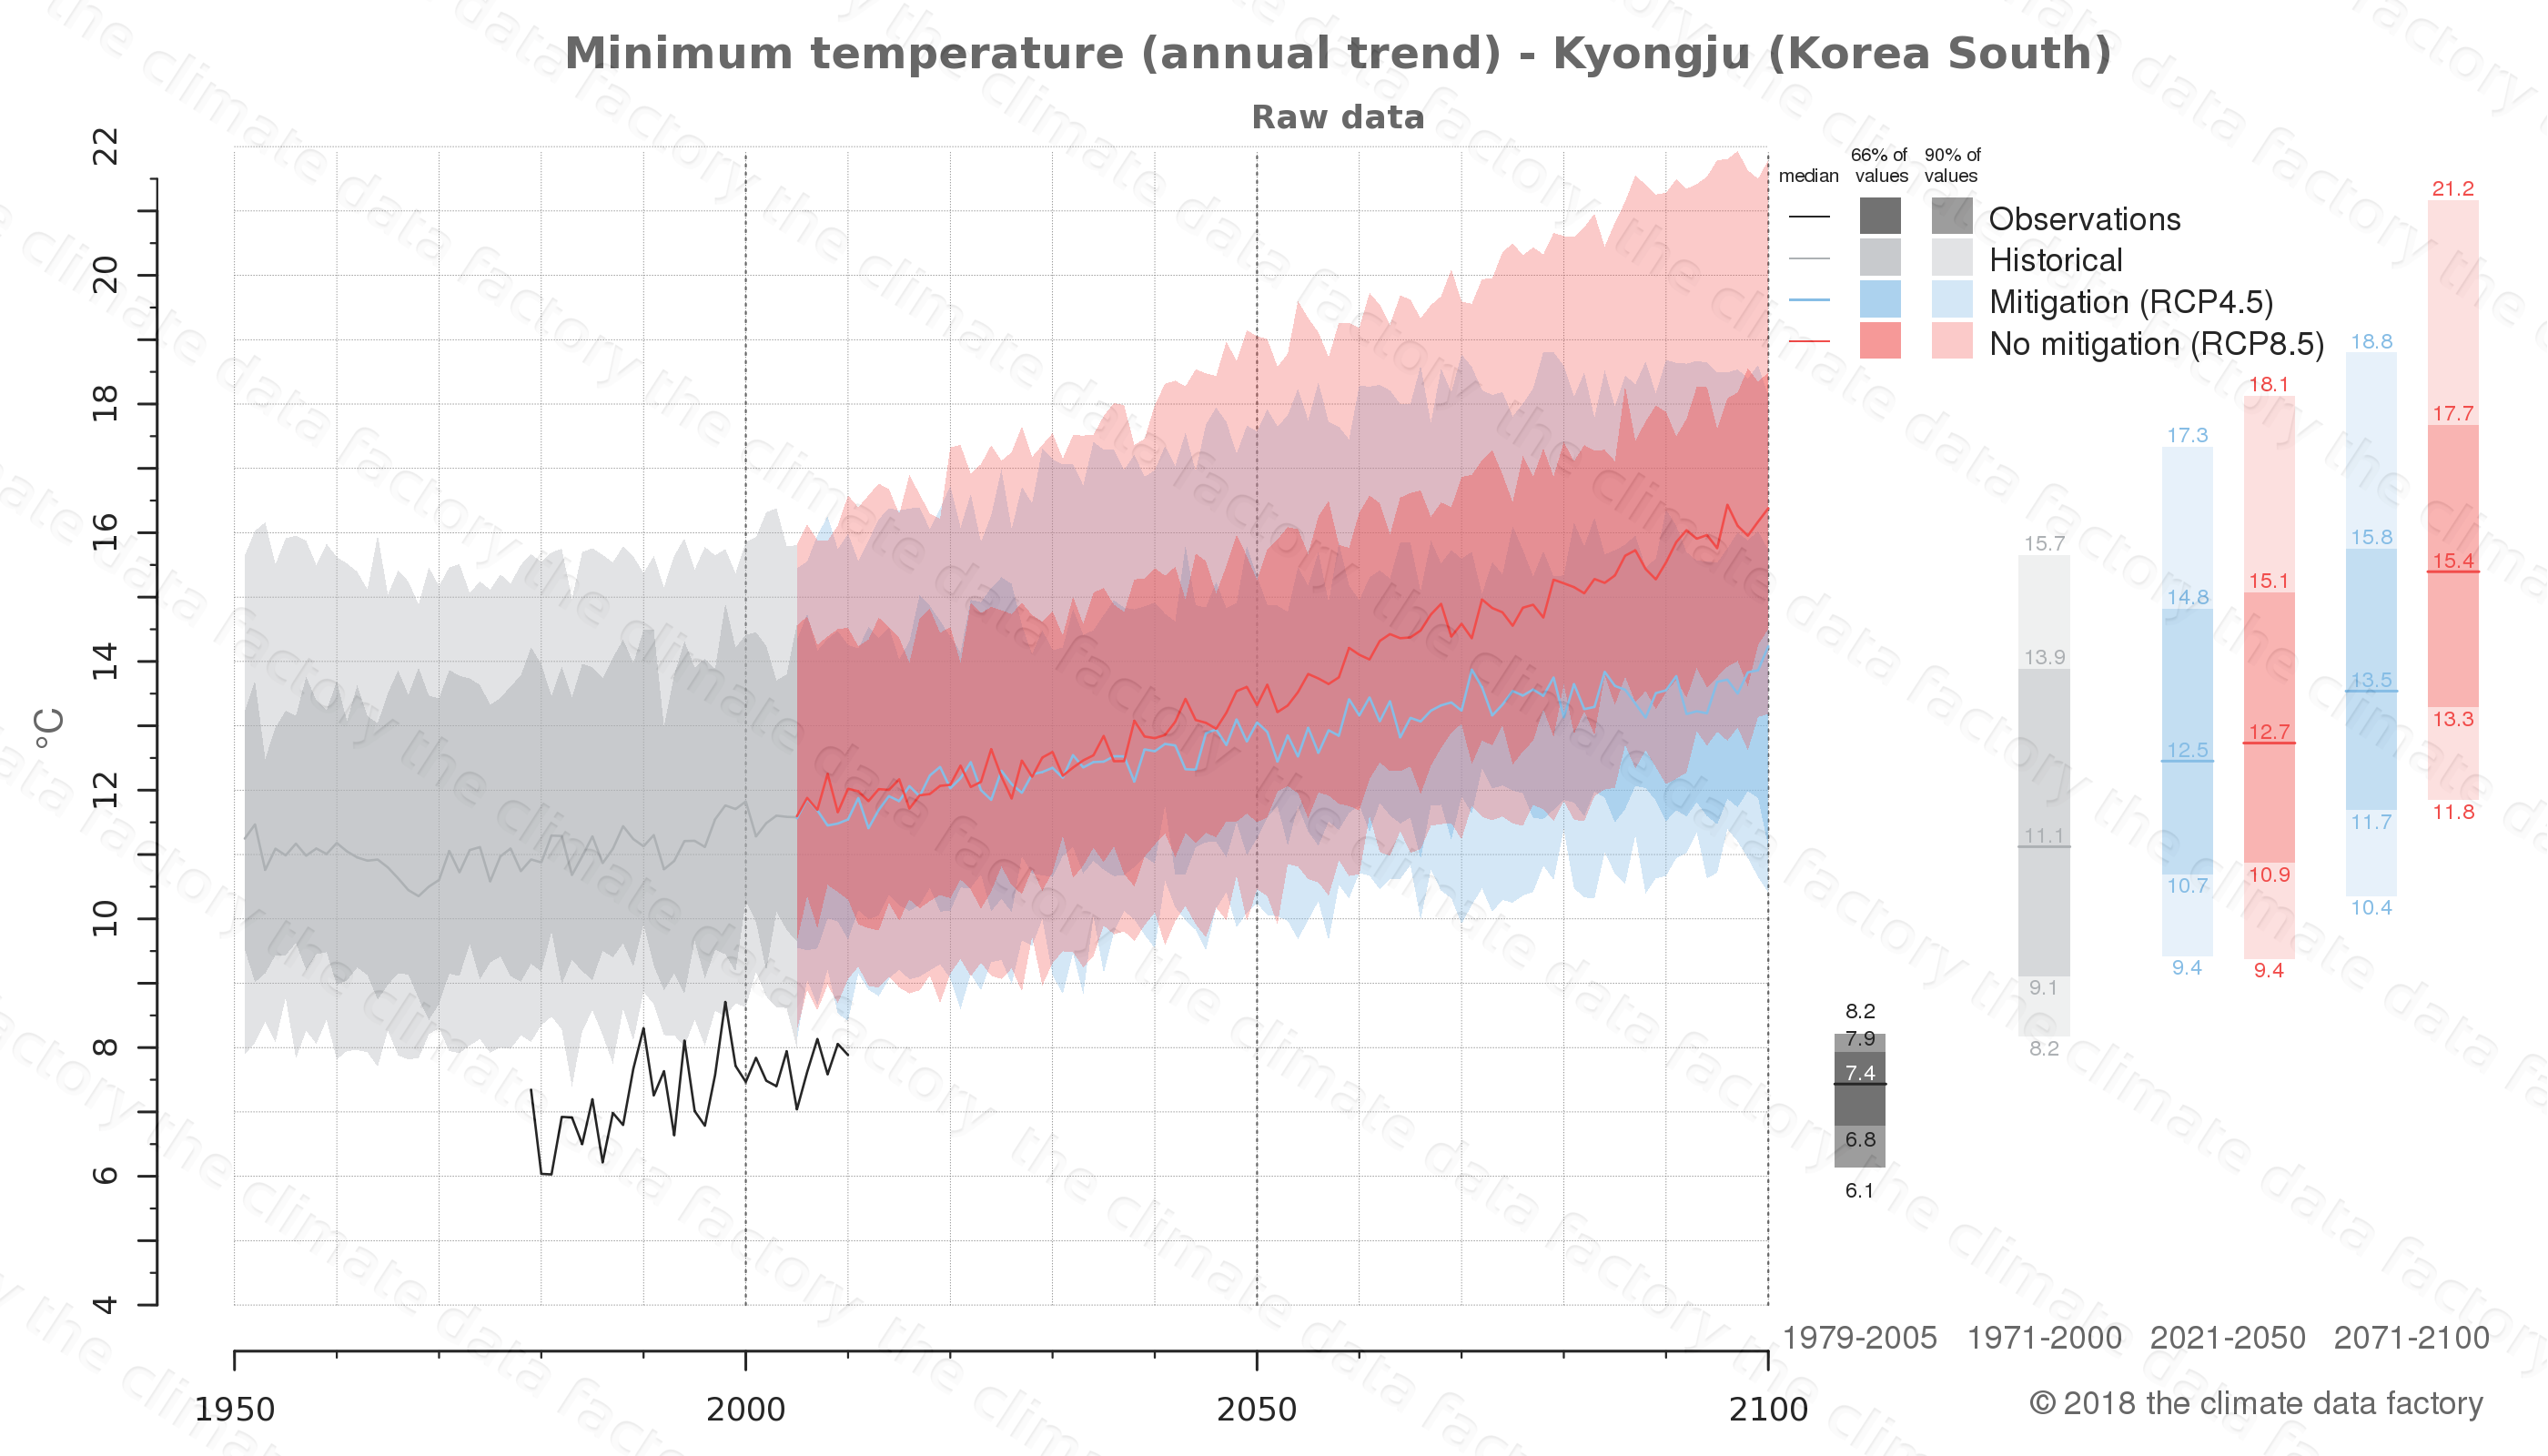 climate change data policy adaptation climate graph city data minimum-temperature kyongju south korea